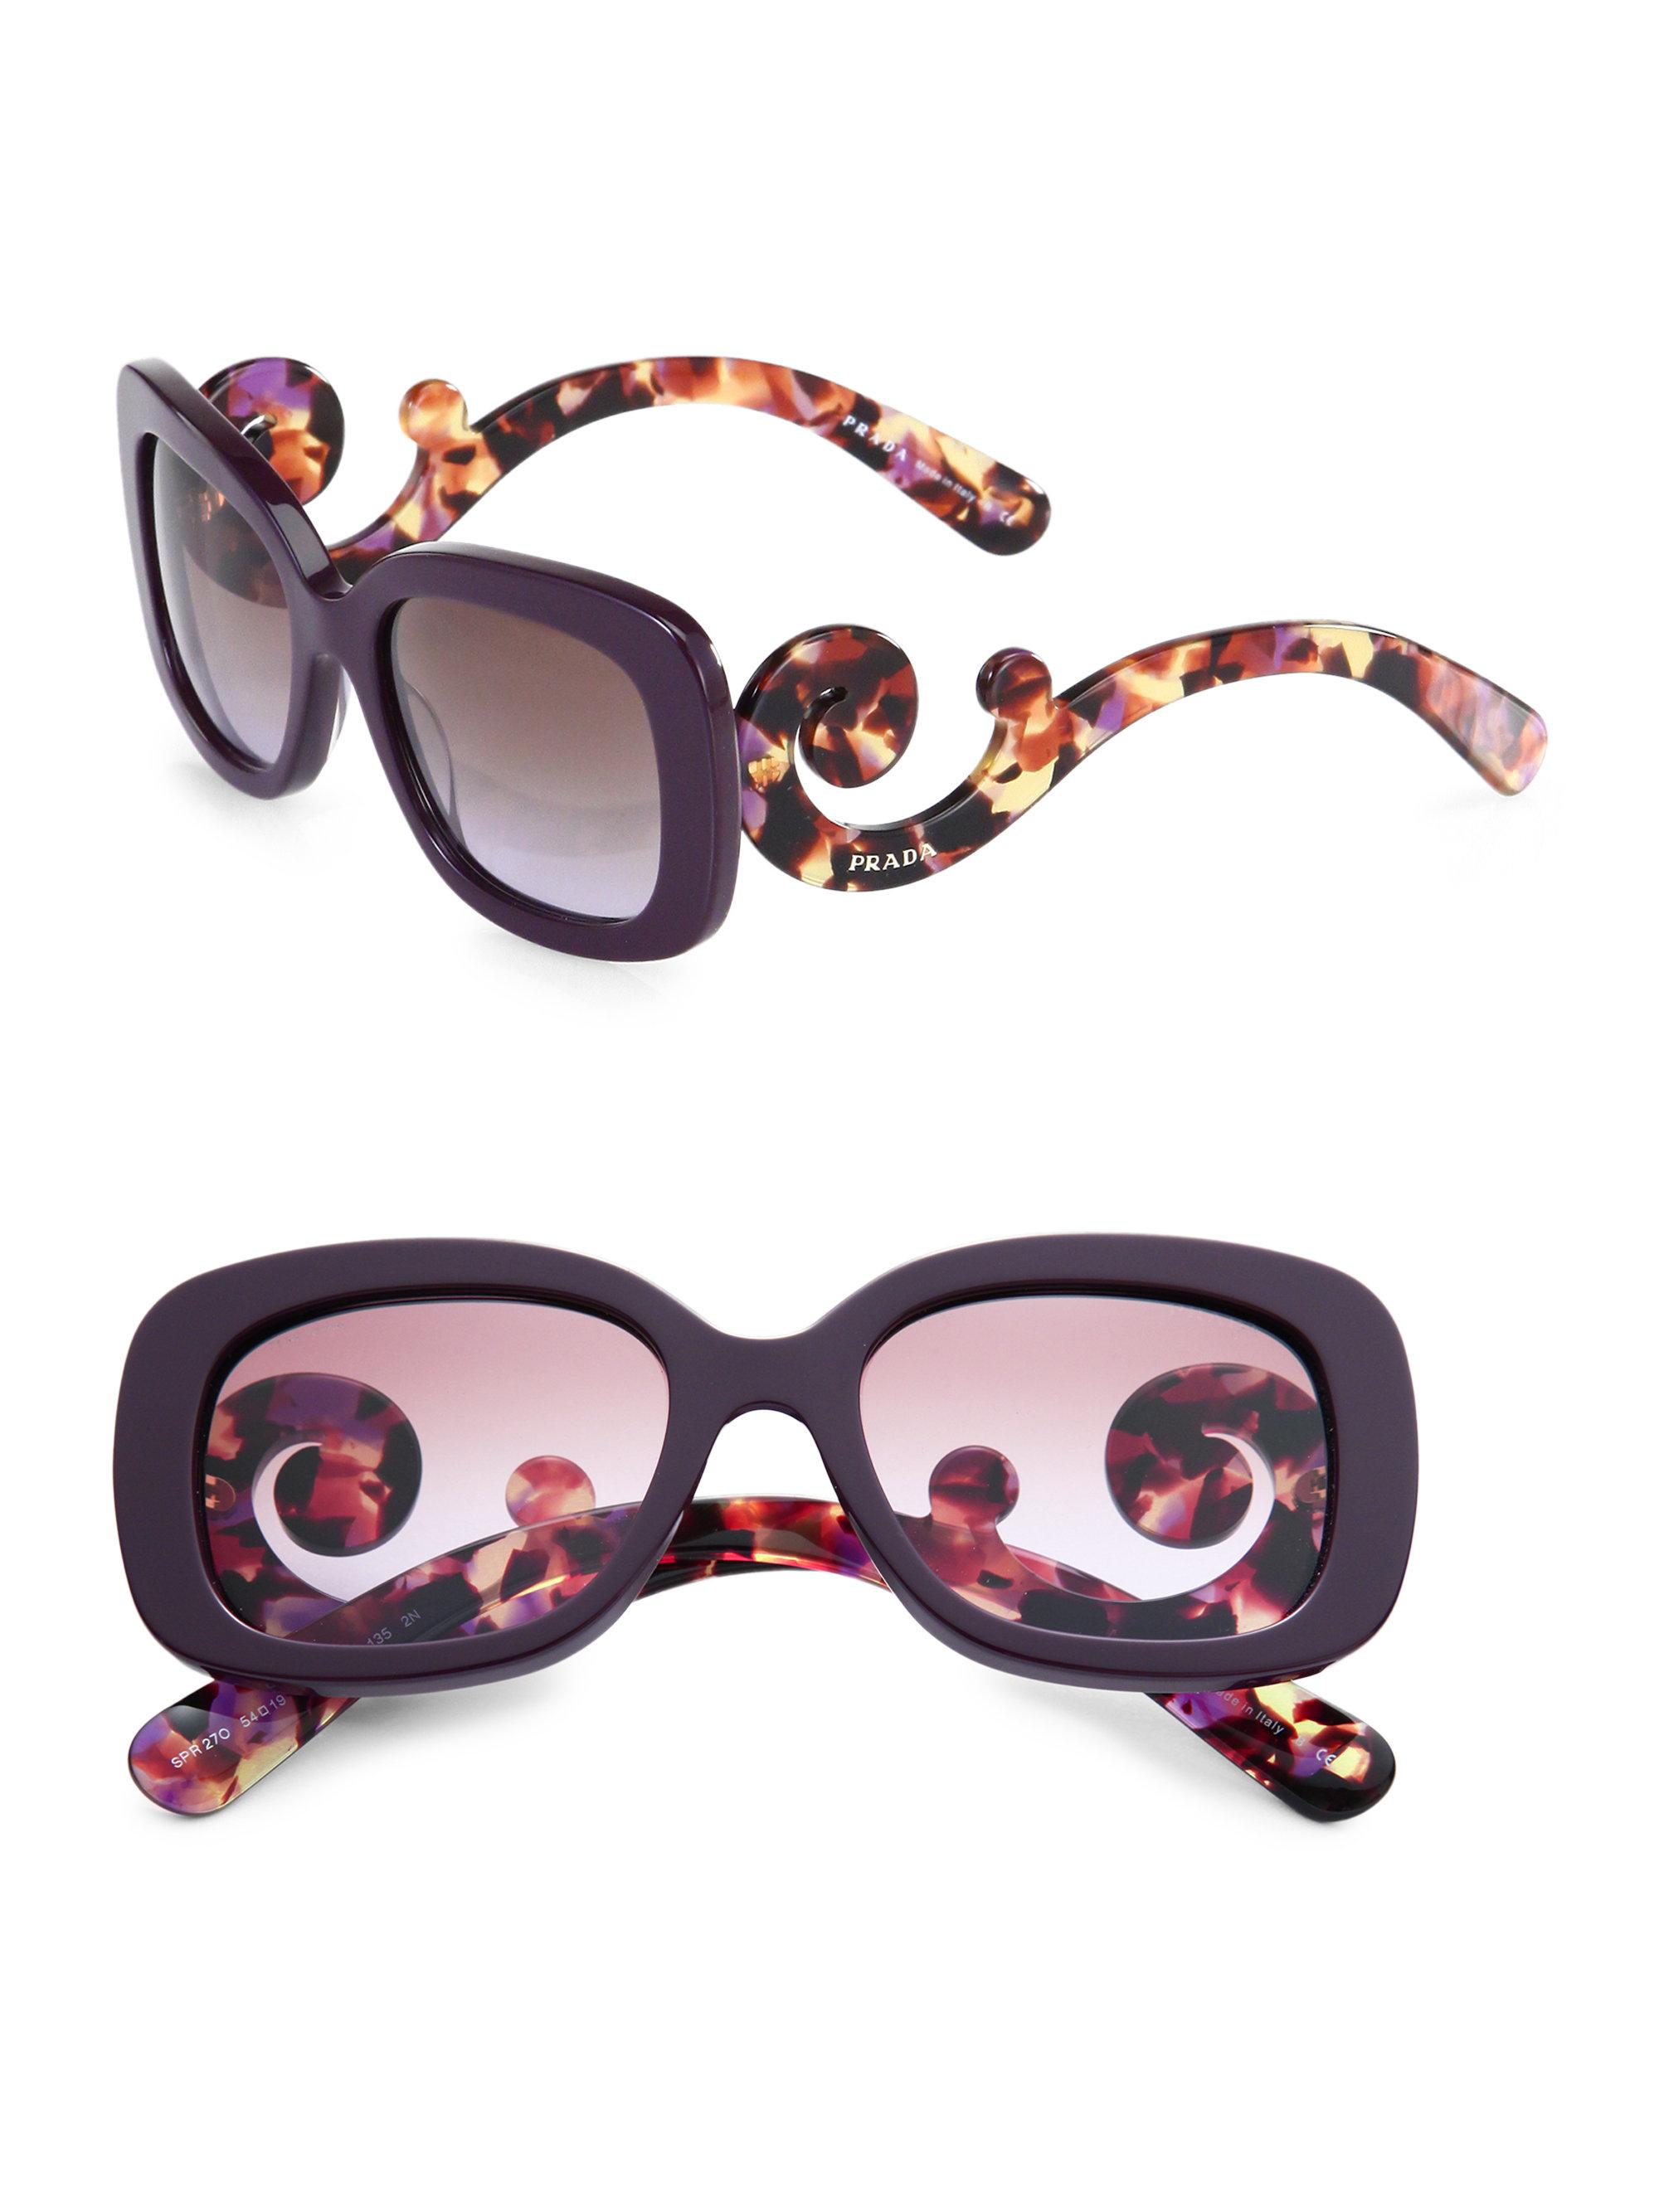 2ba38533659f ... best price lyst prada baroque square sunglasses in purple 78007 500ad